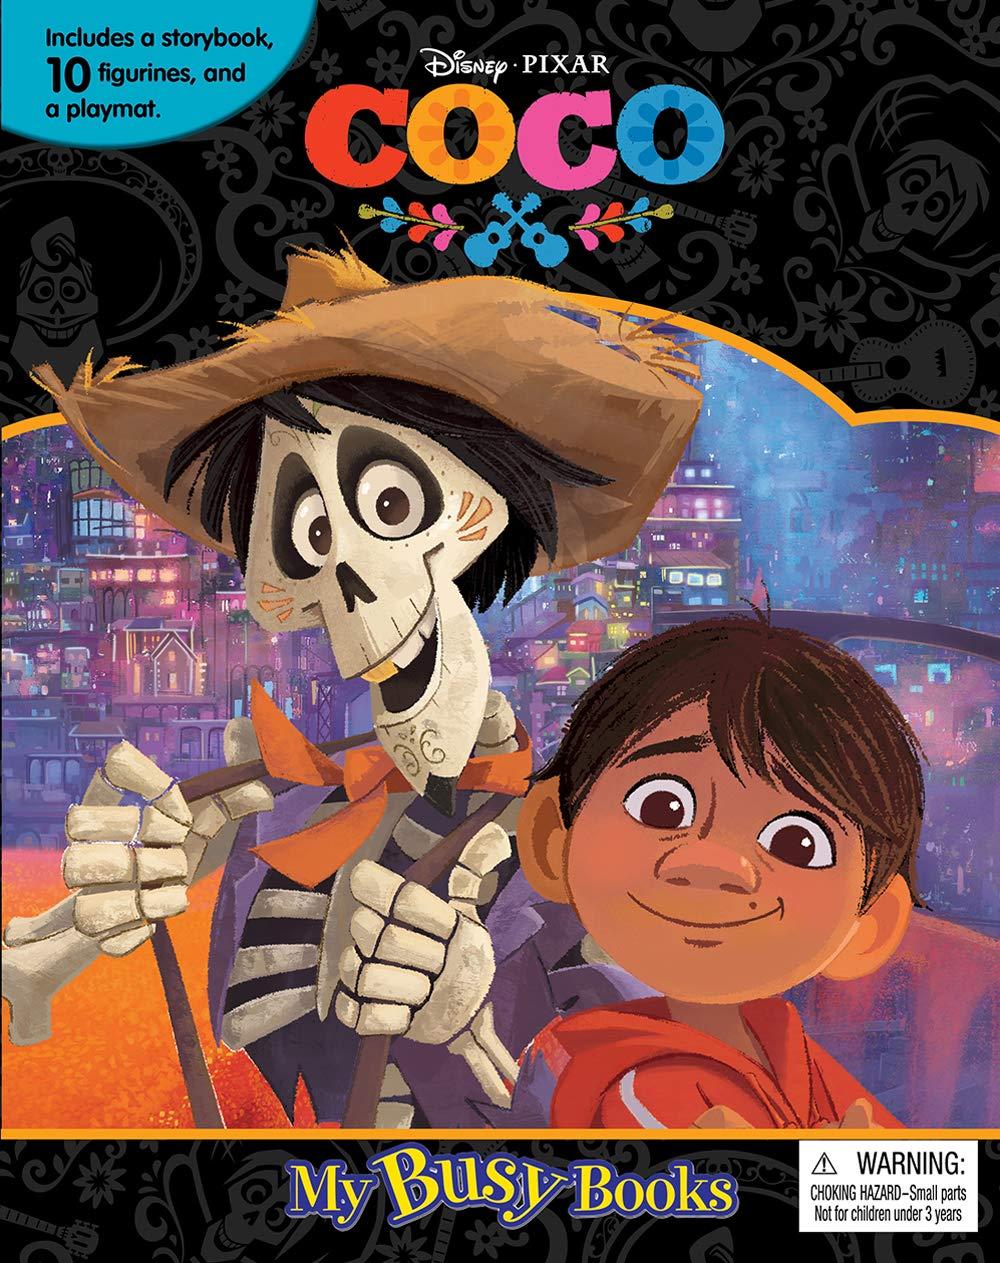 coco full movie 2018 english download